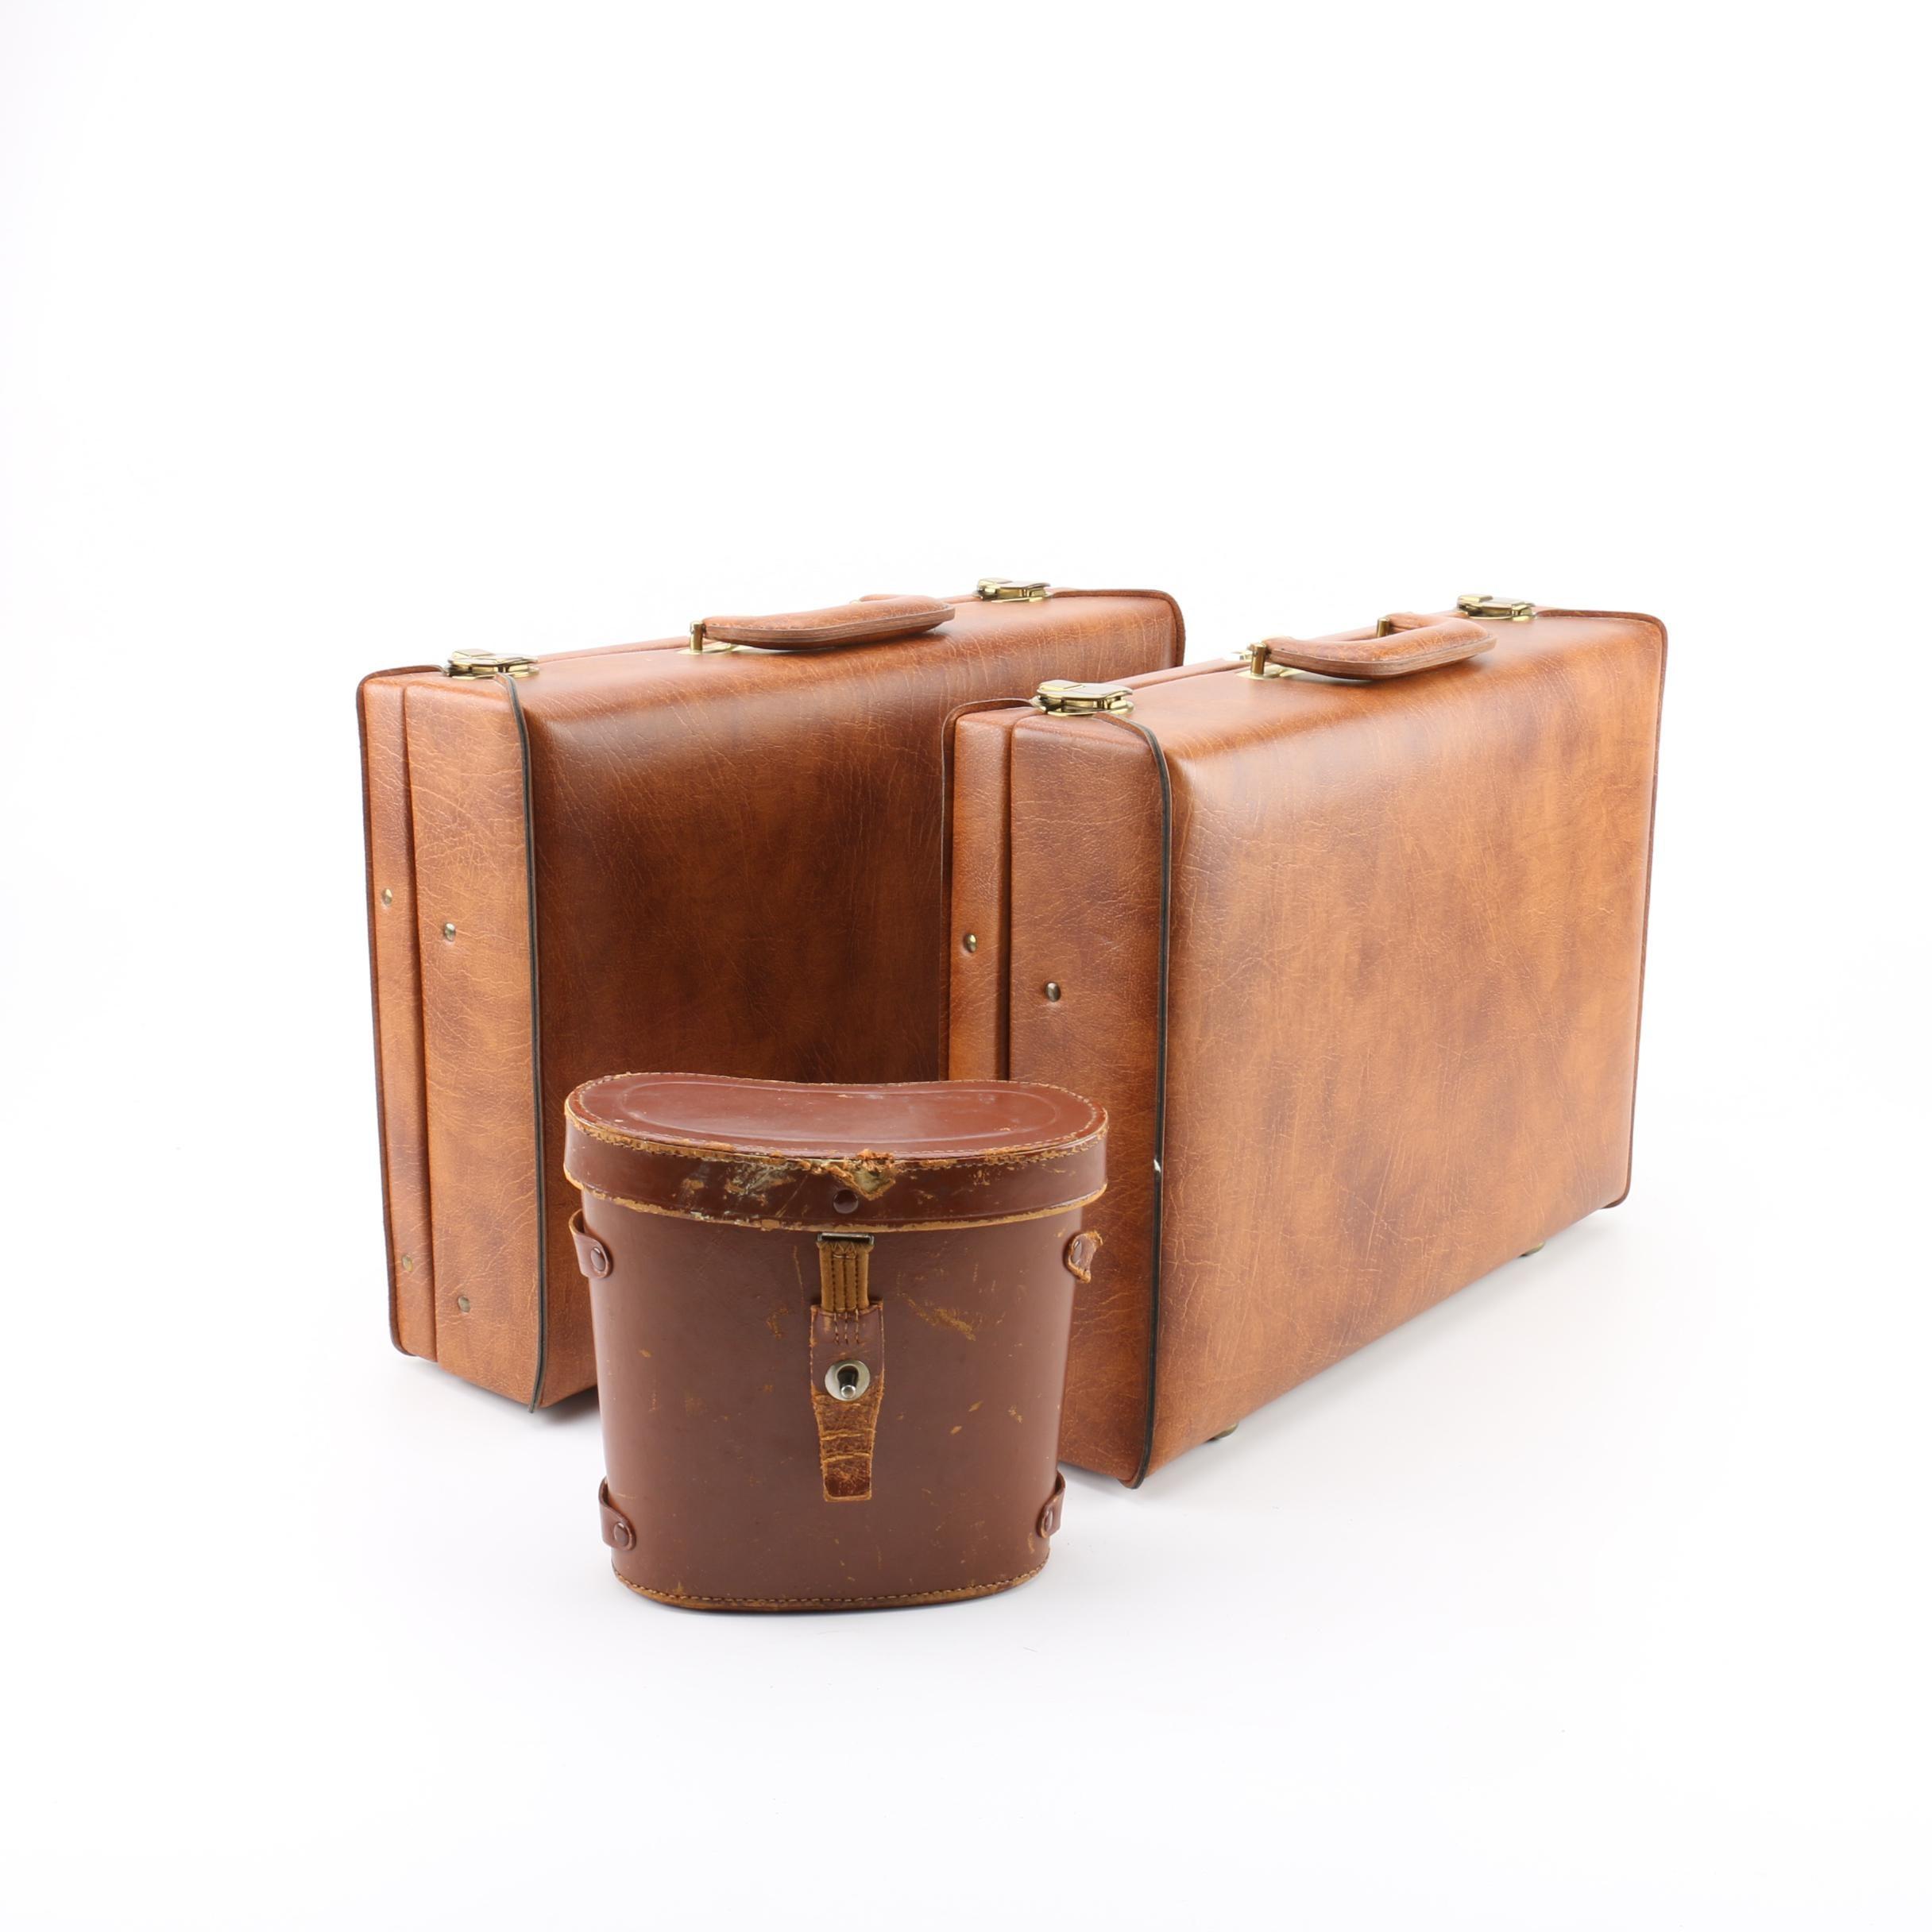 Vintage Airway Presto Lock Briefcases and Prismex 7X50 Binoculars